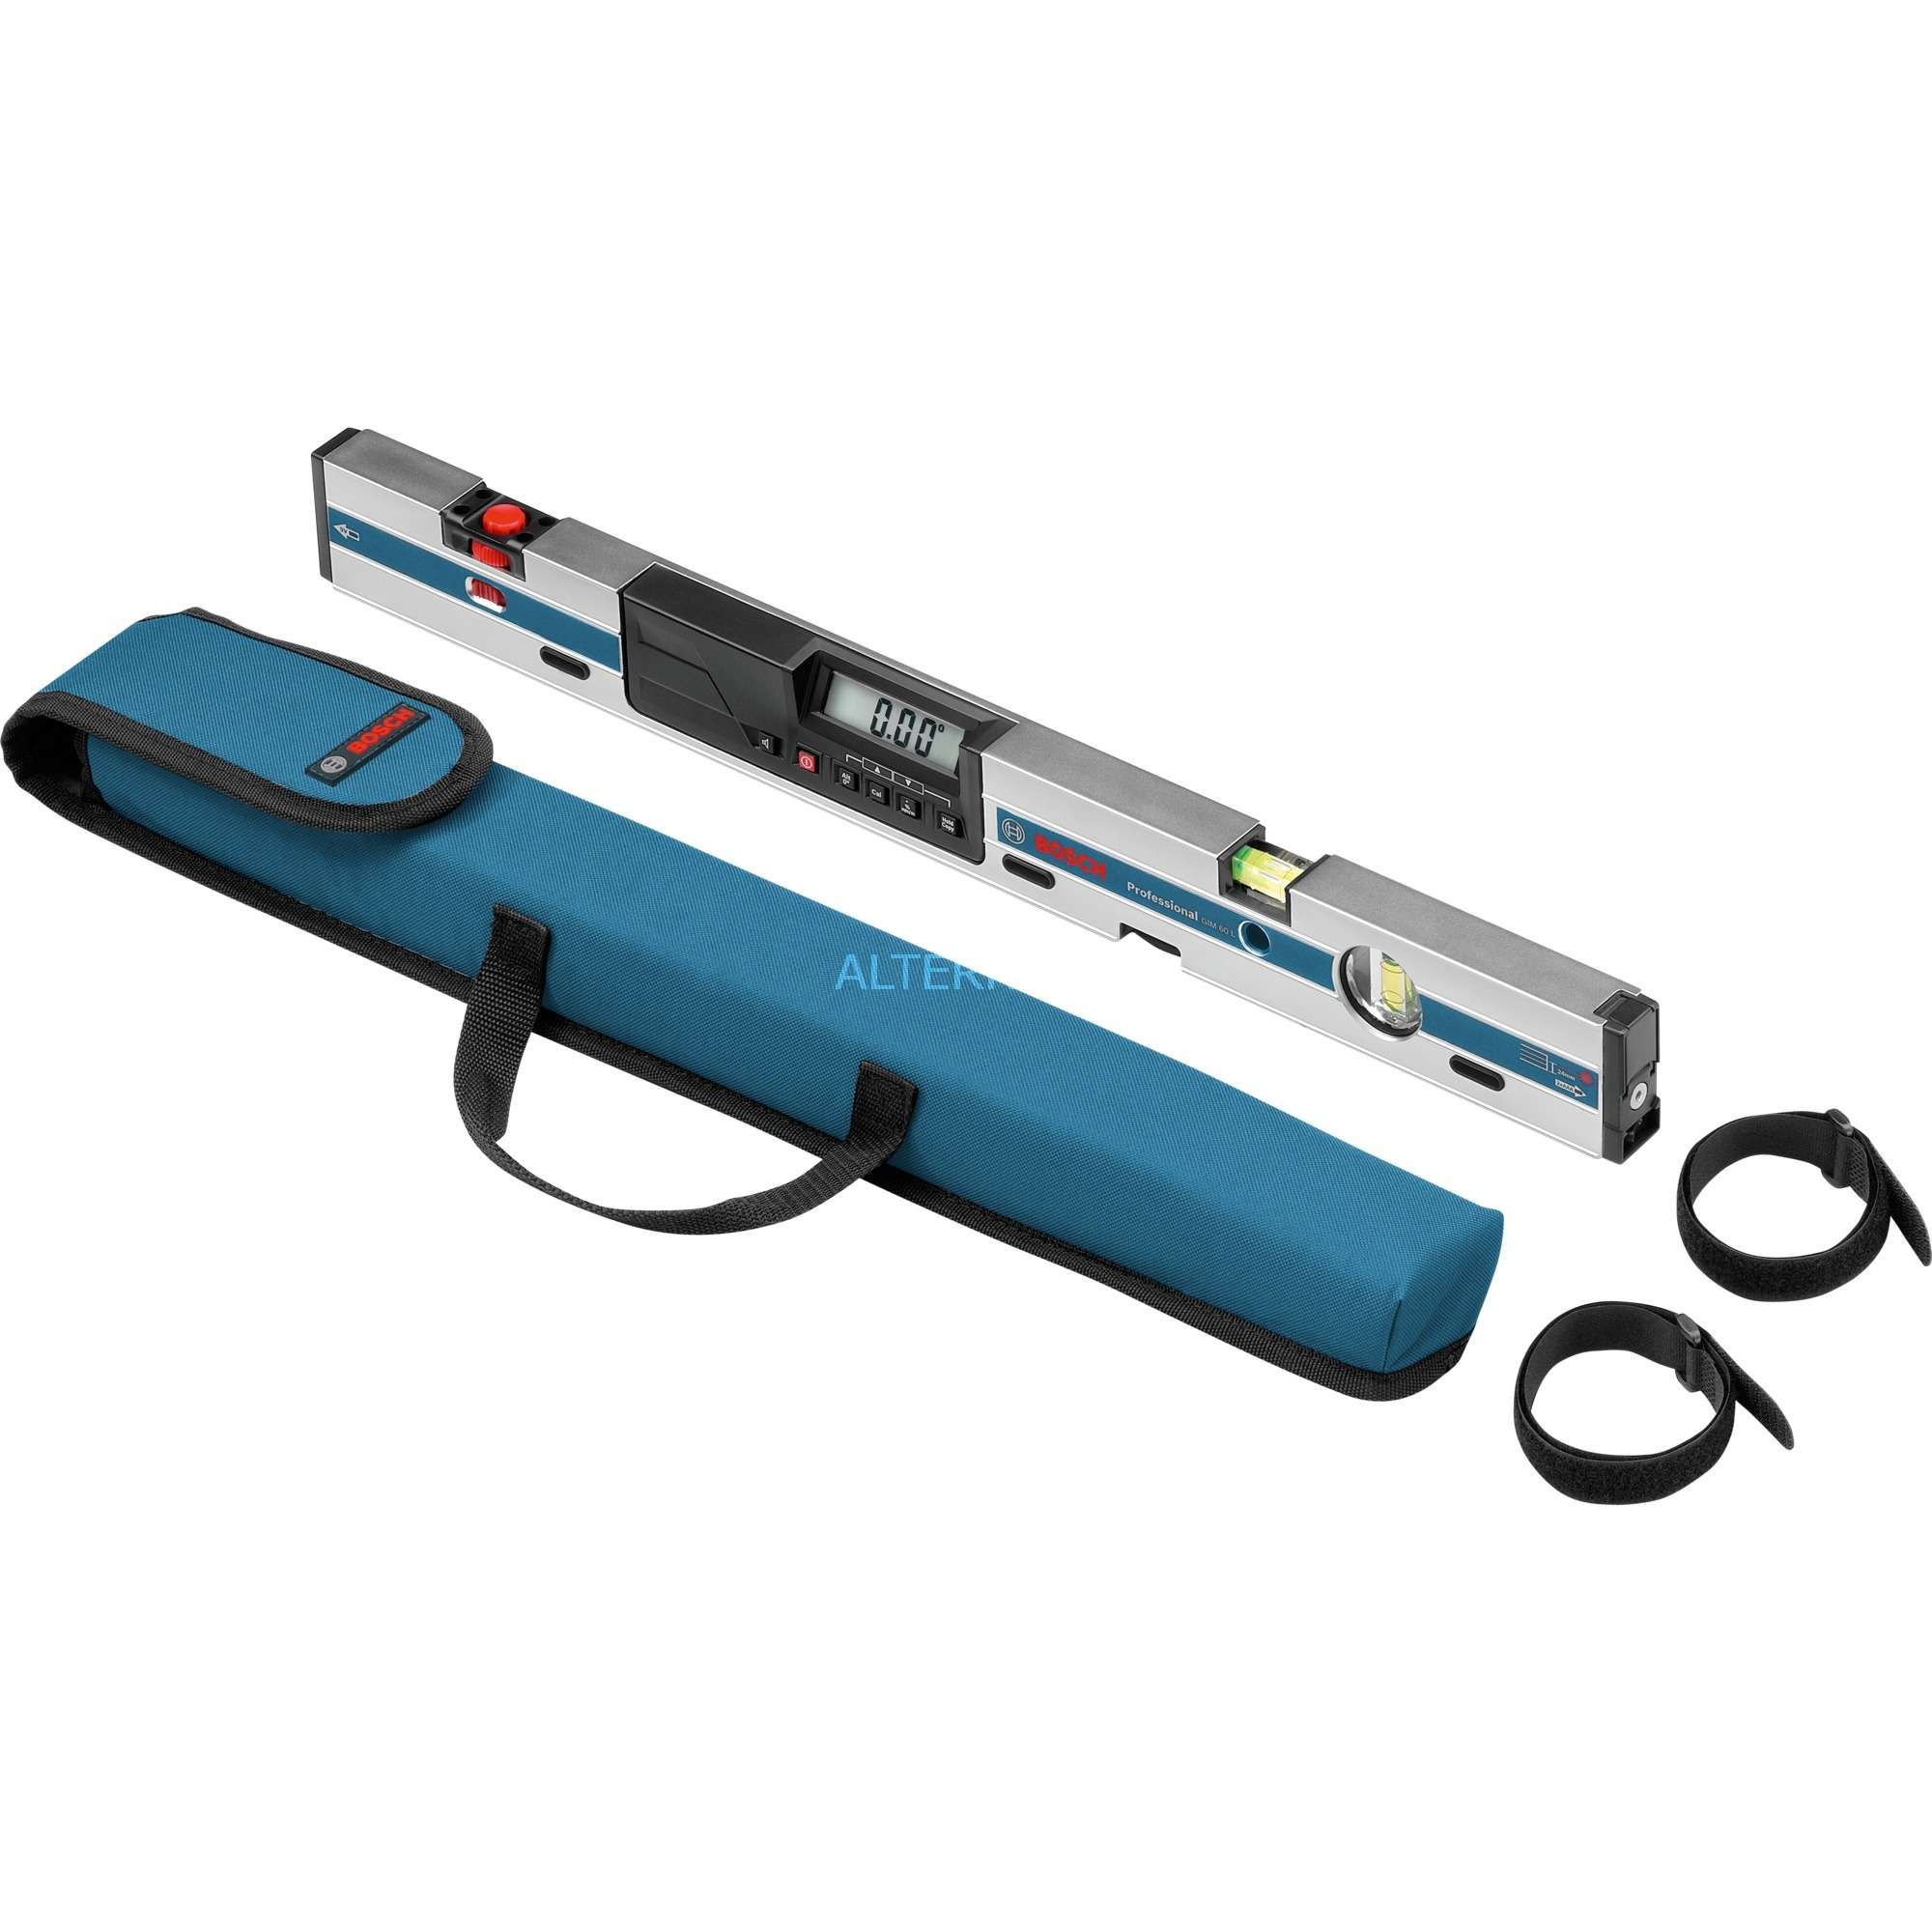 GIM 60 L Professional medidor de ángulos digital 0 - 360°, Clinómetro